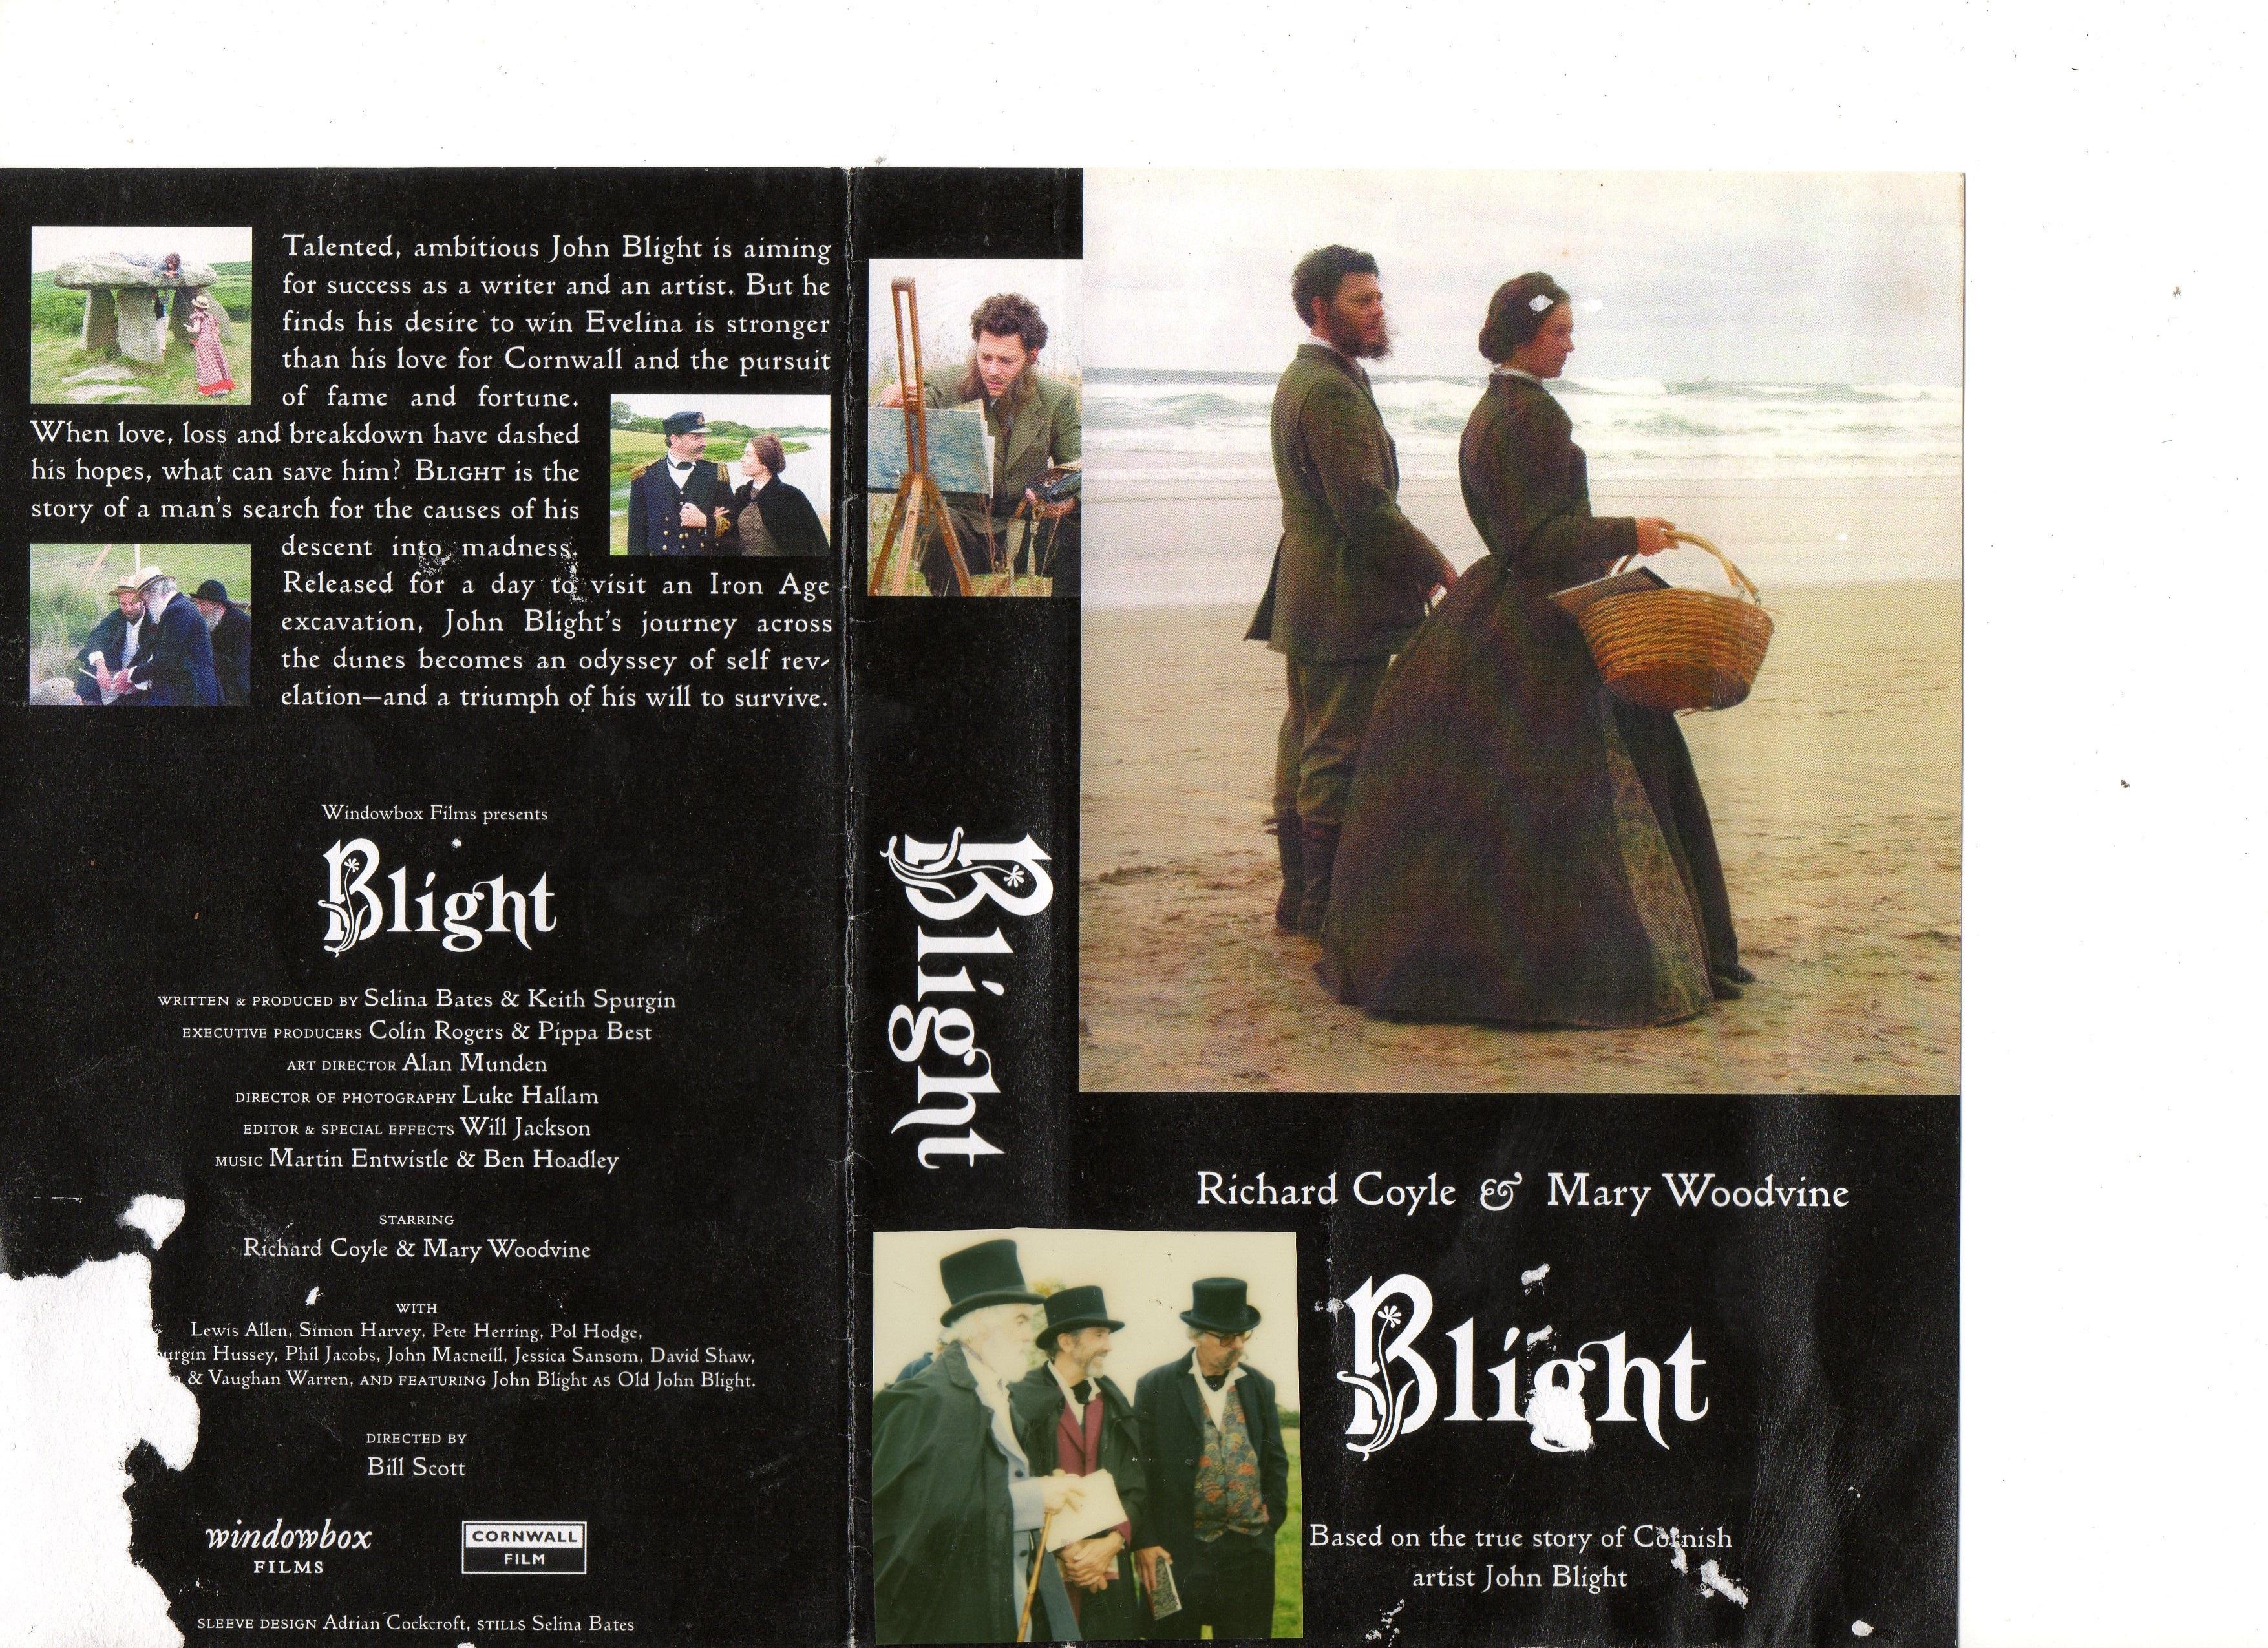 Blight (2003)